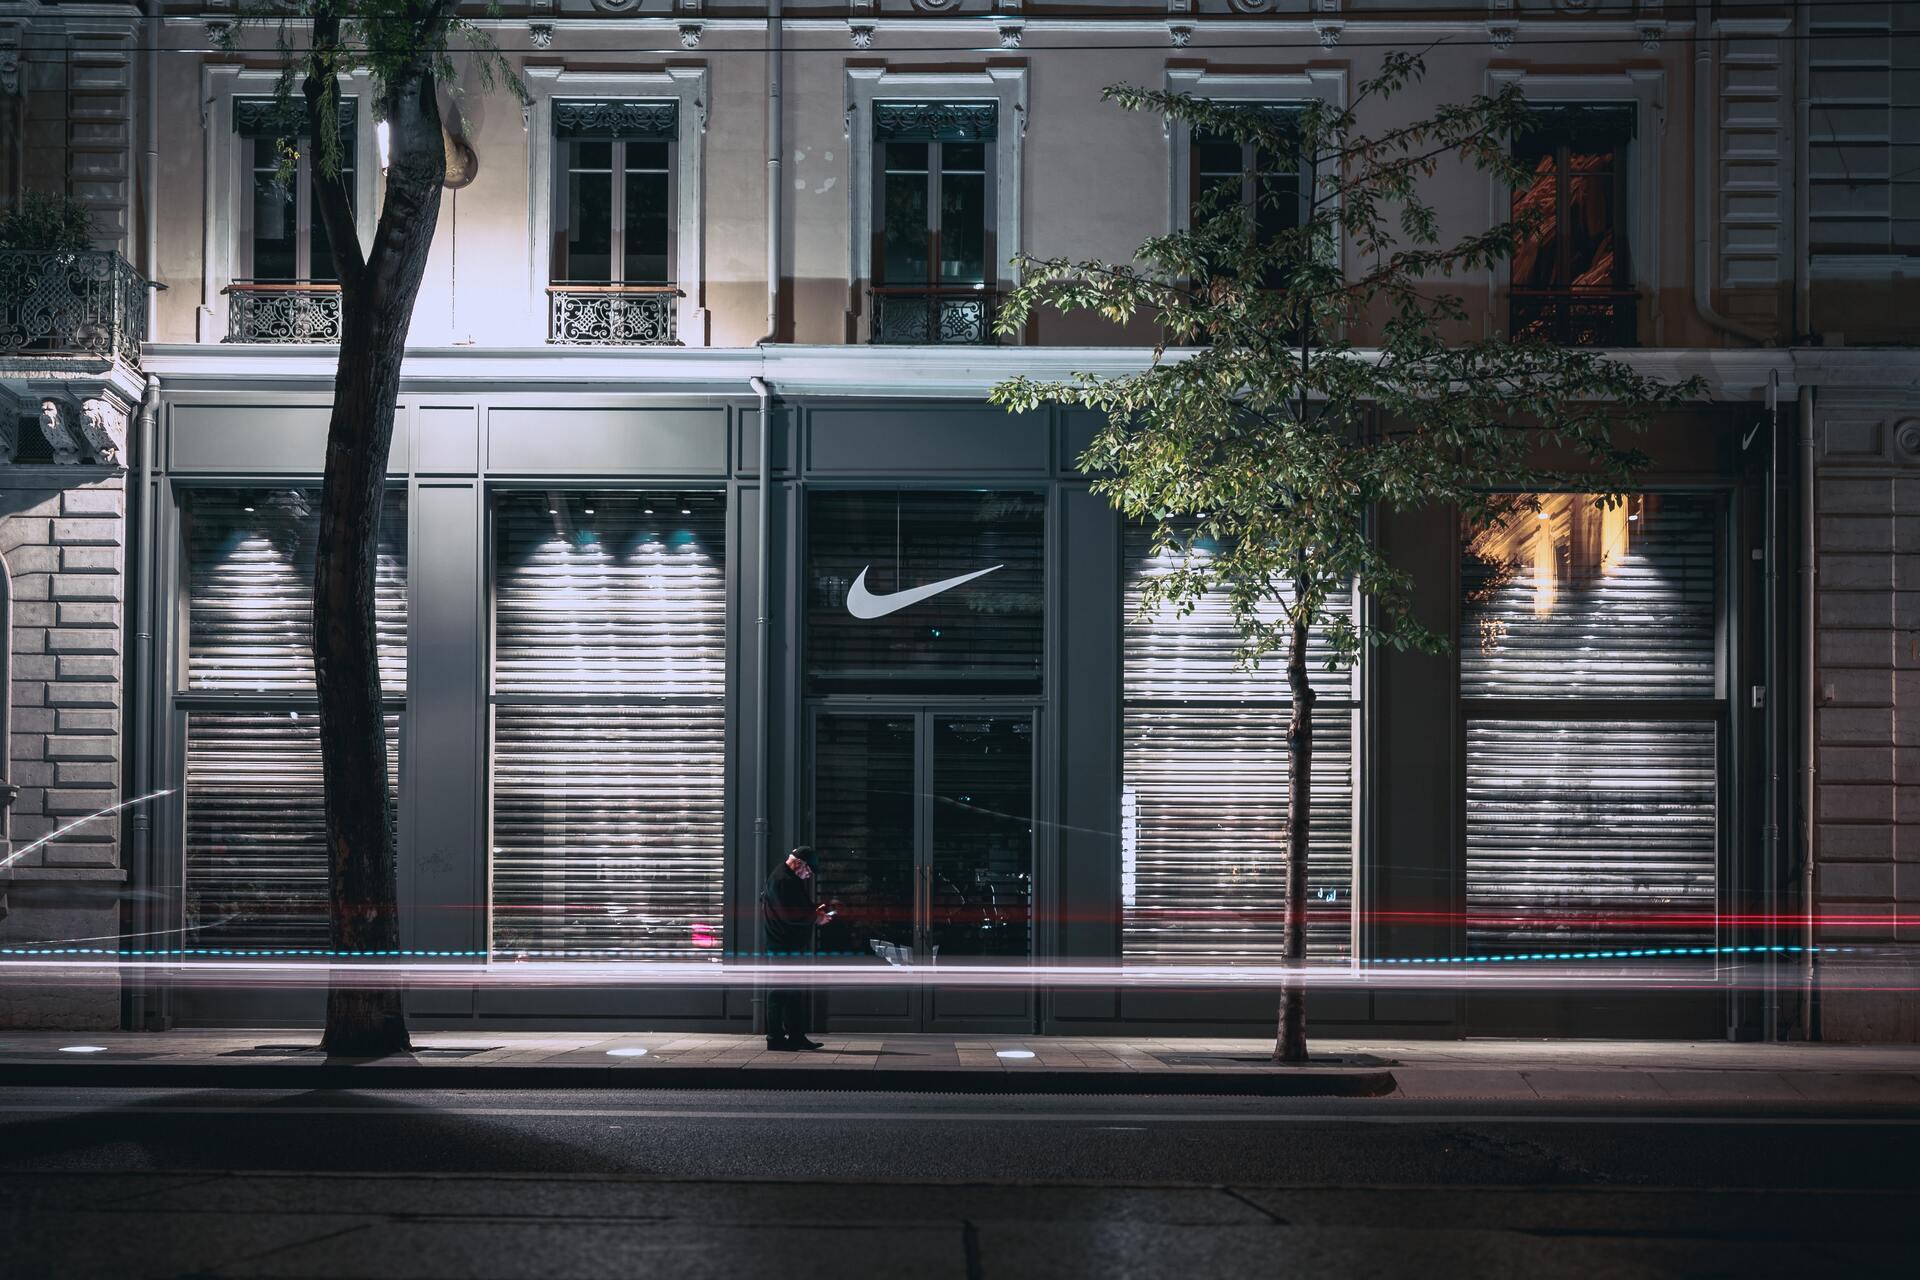 FIX Can't access Nike website